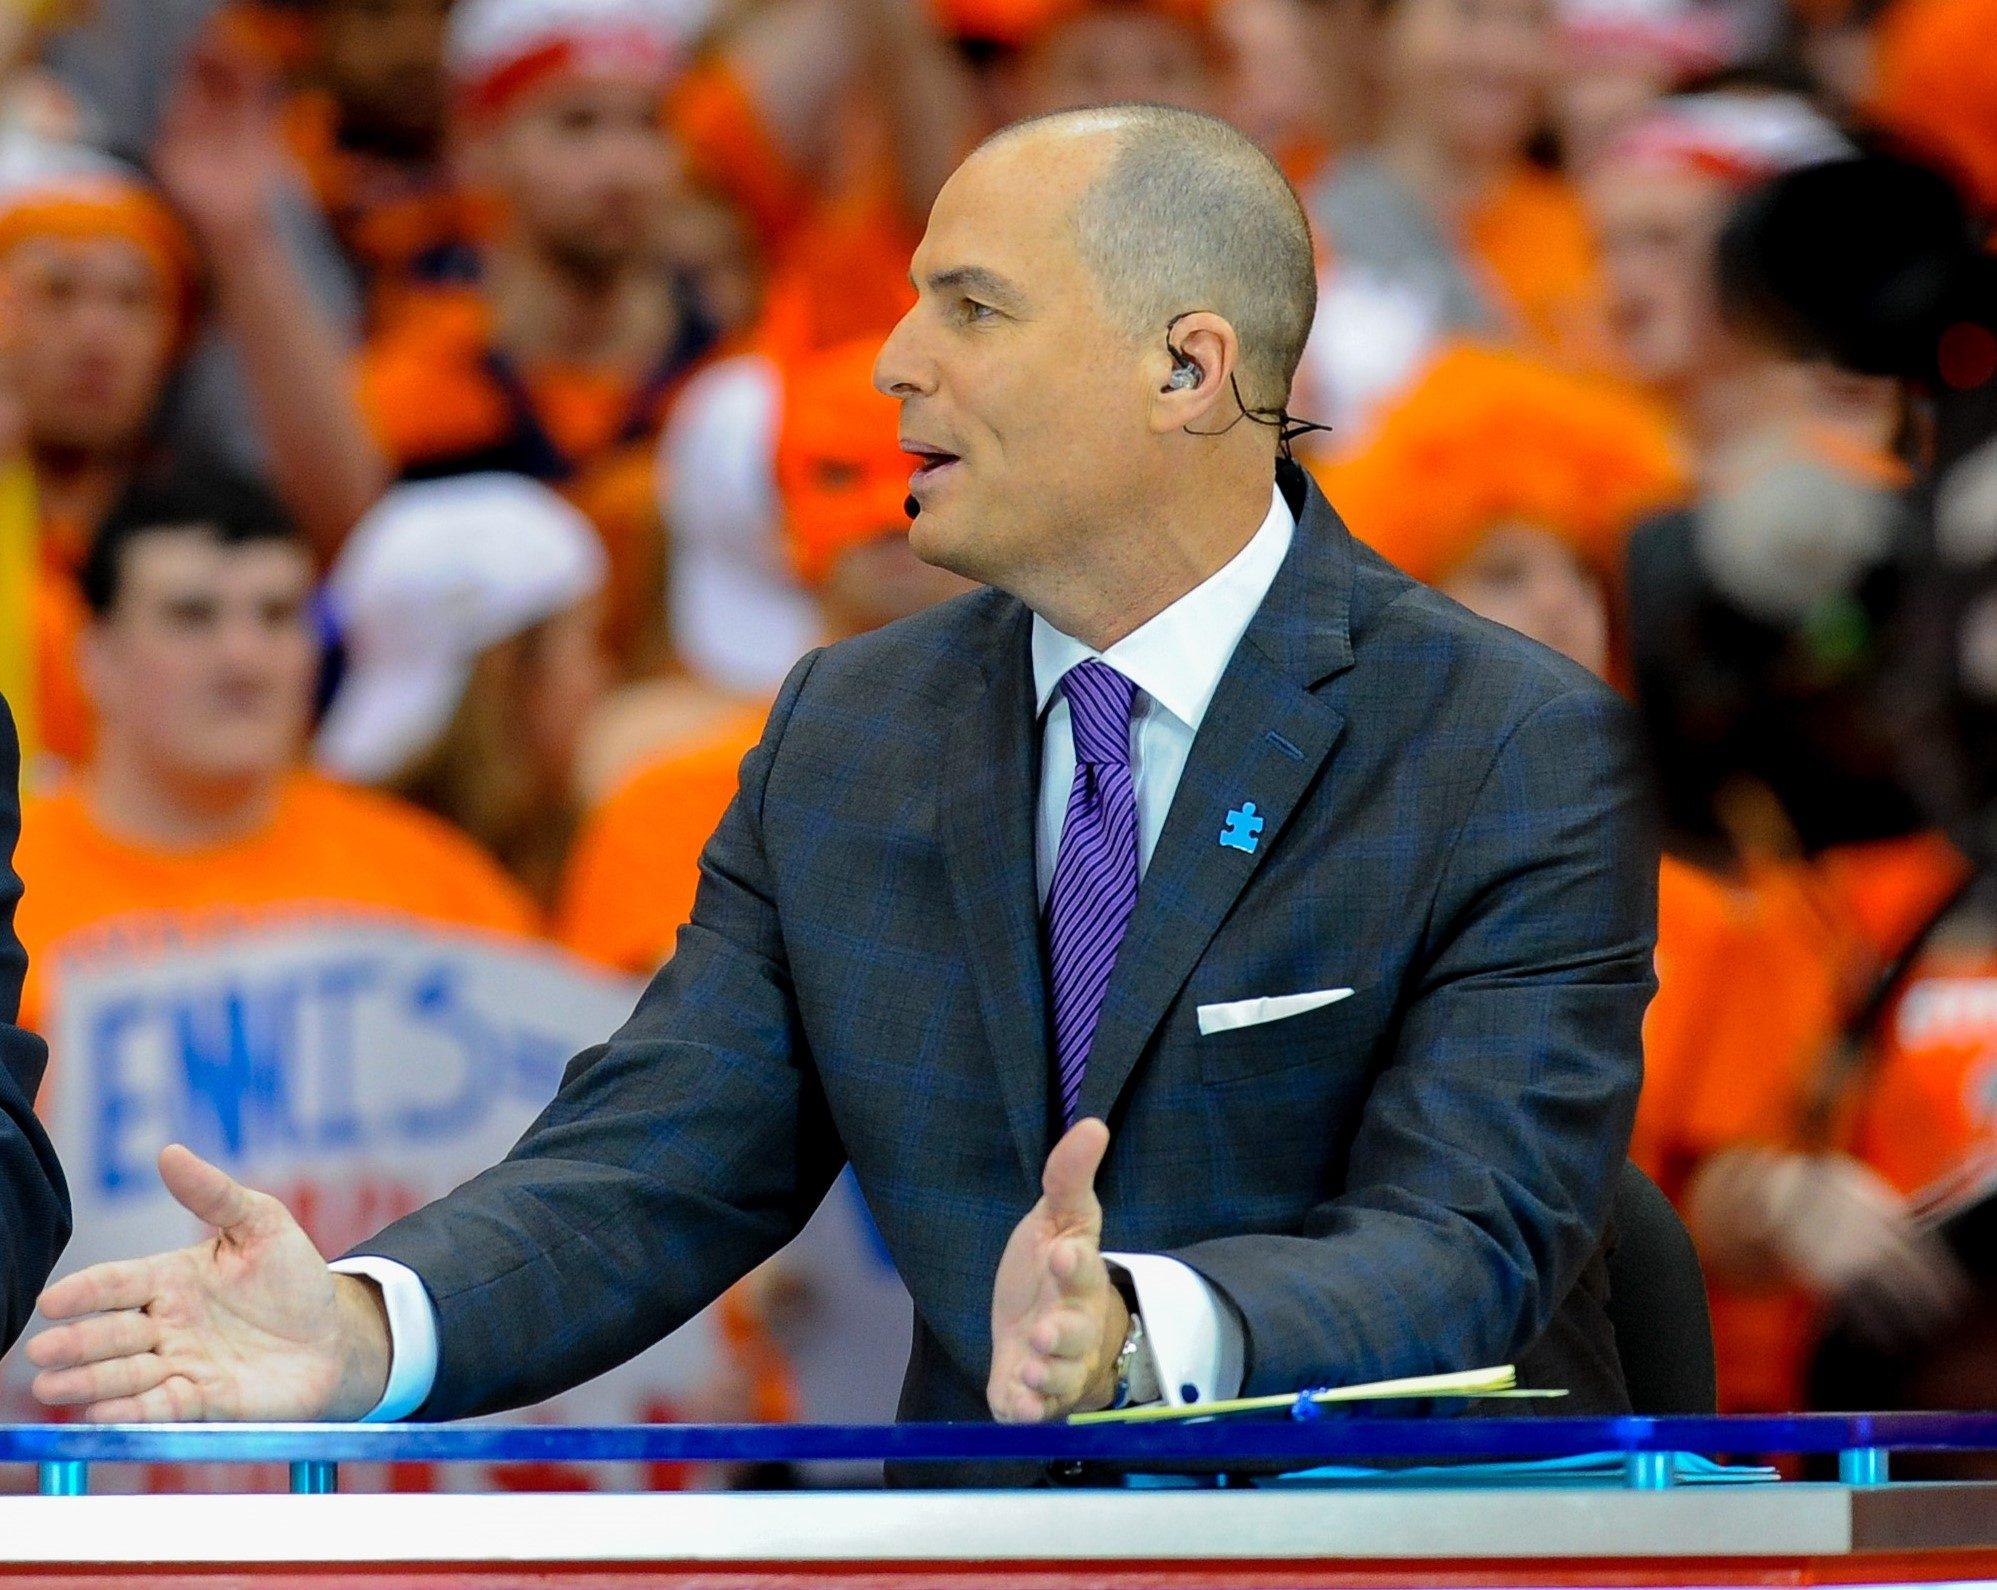 Jay BIlas ESPN anchor